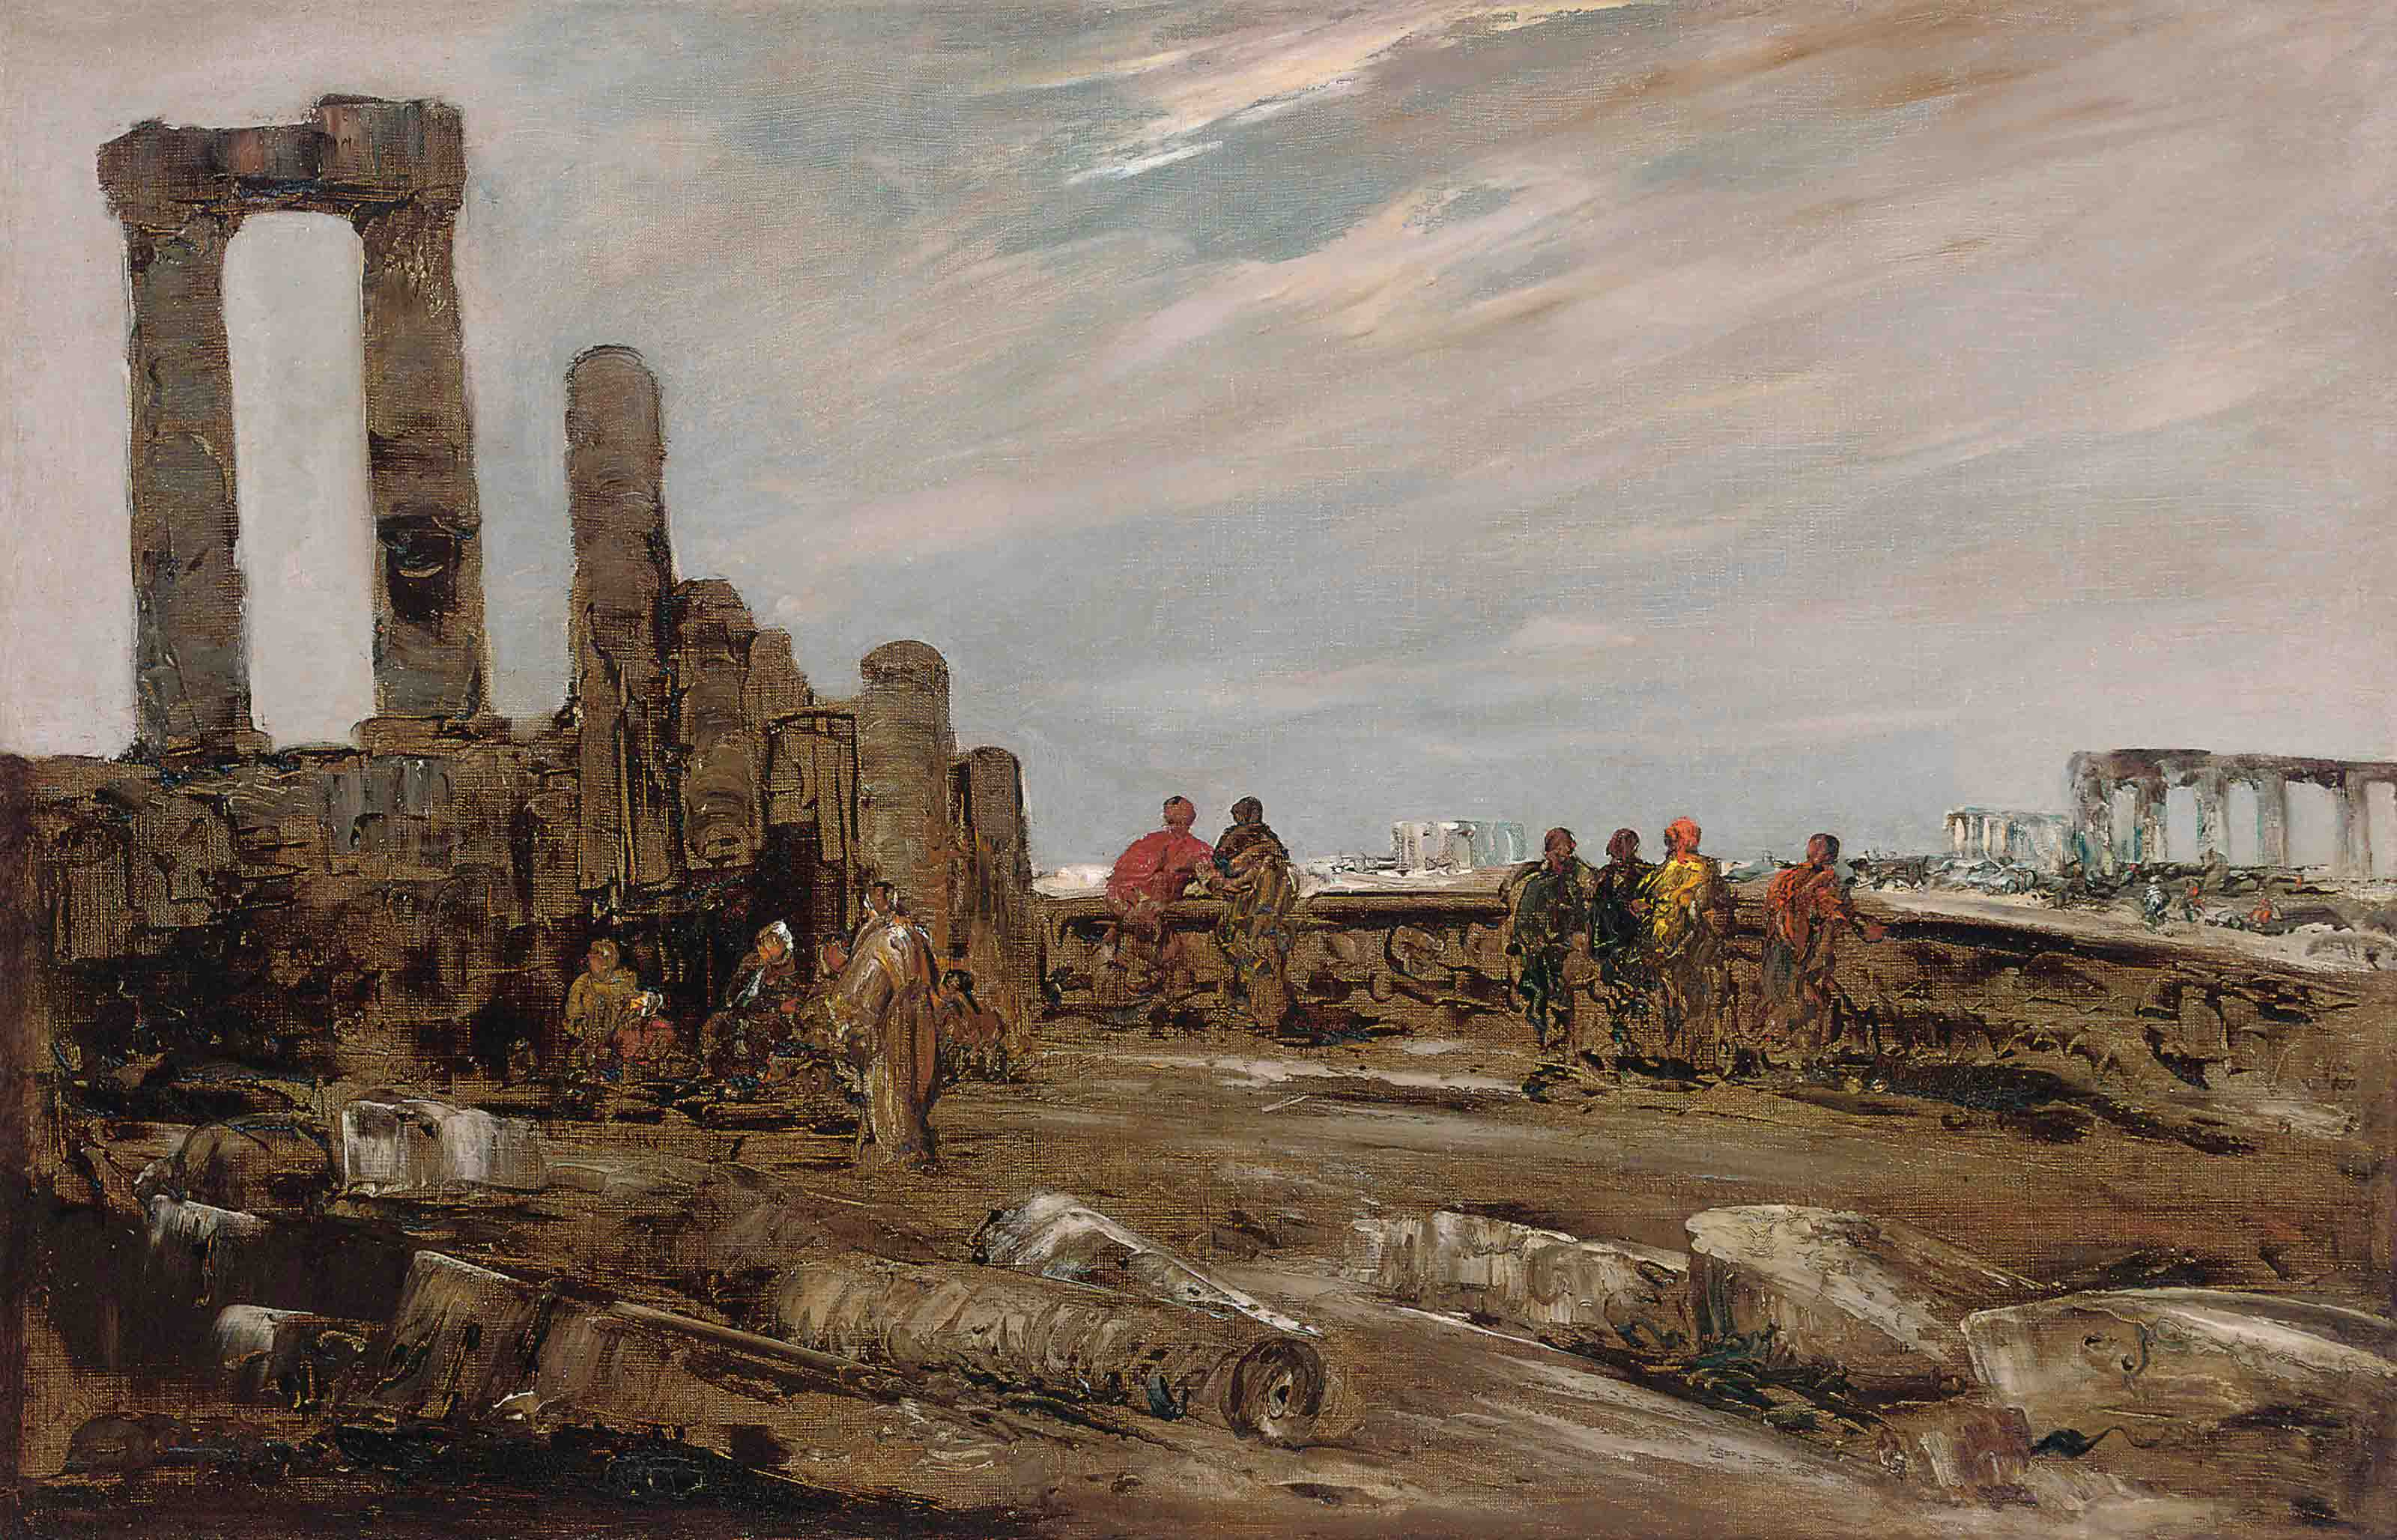 Arabs amongst the ruins